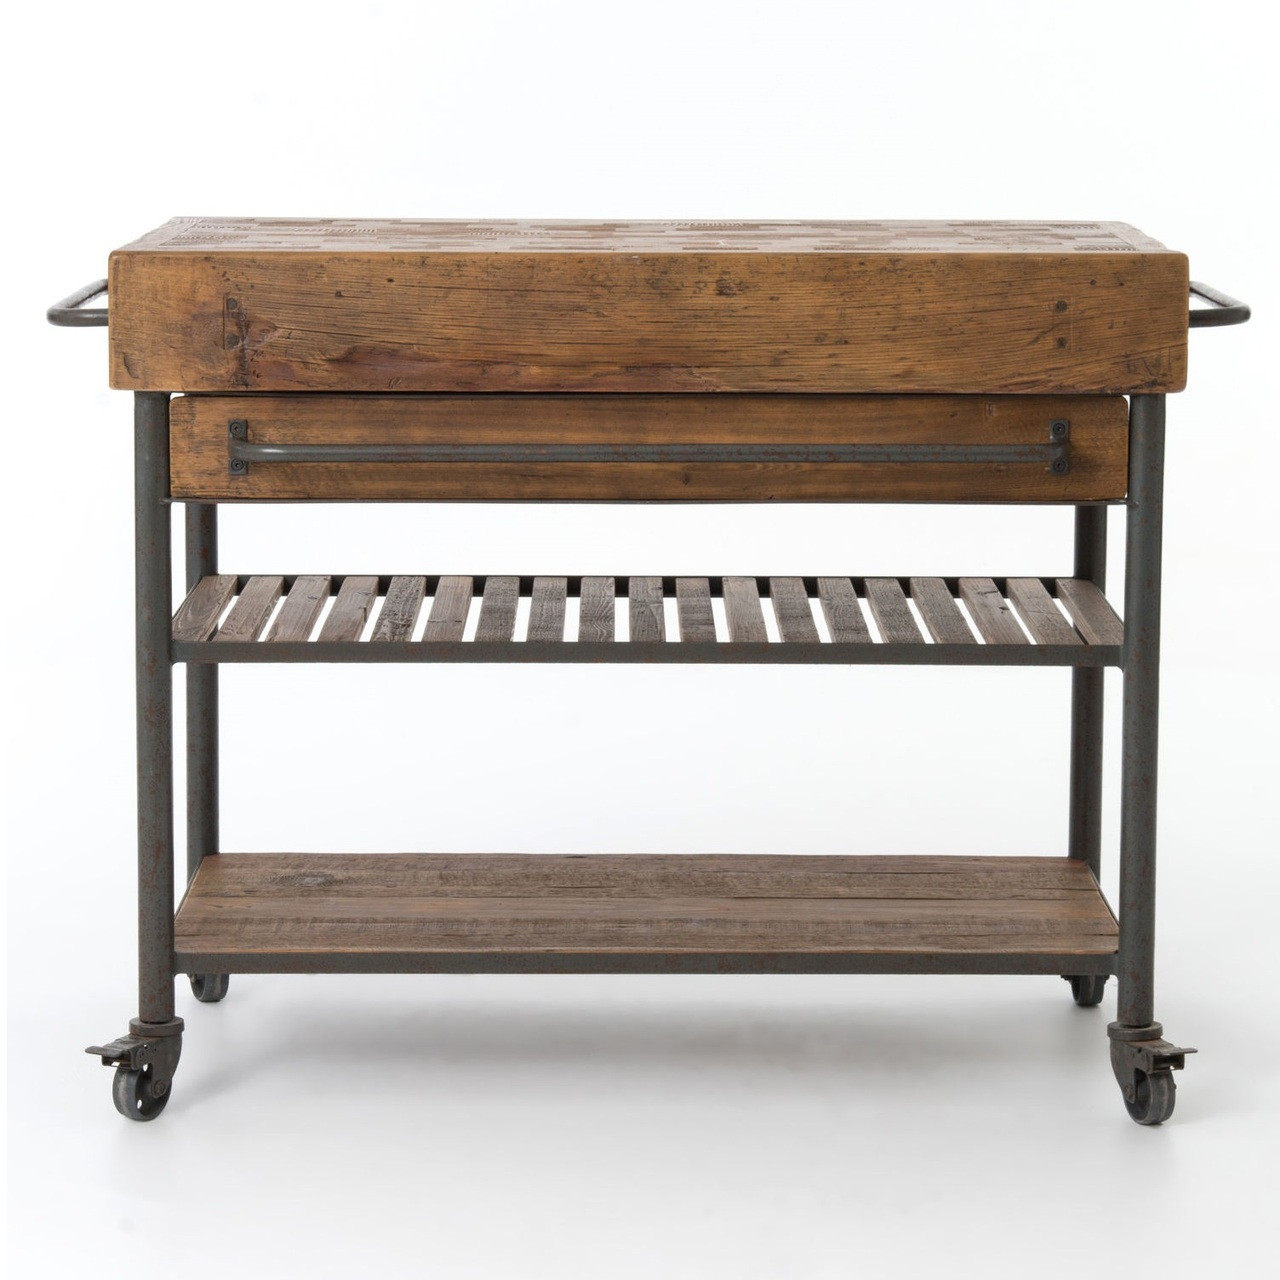 Urban Industrial Age Kitchen Warehouse Cart Island By: Industrial Reclaimed Wood Kitchen Island Cart On Wheels